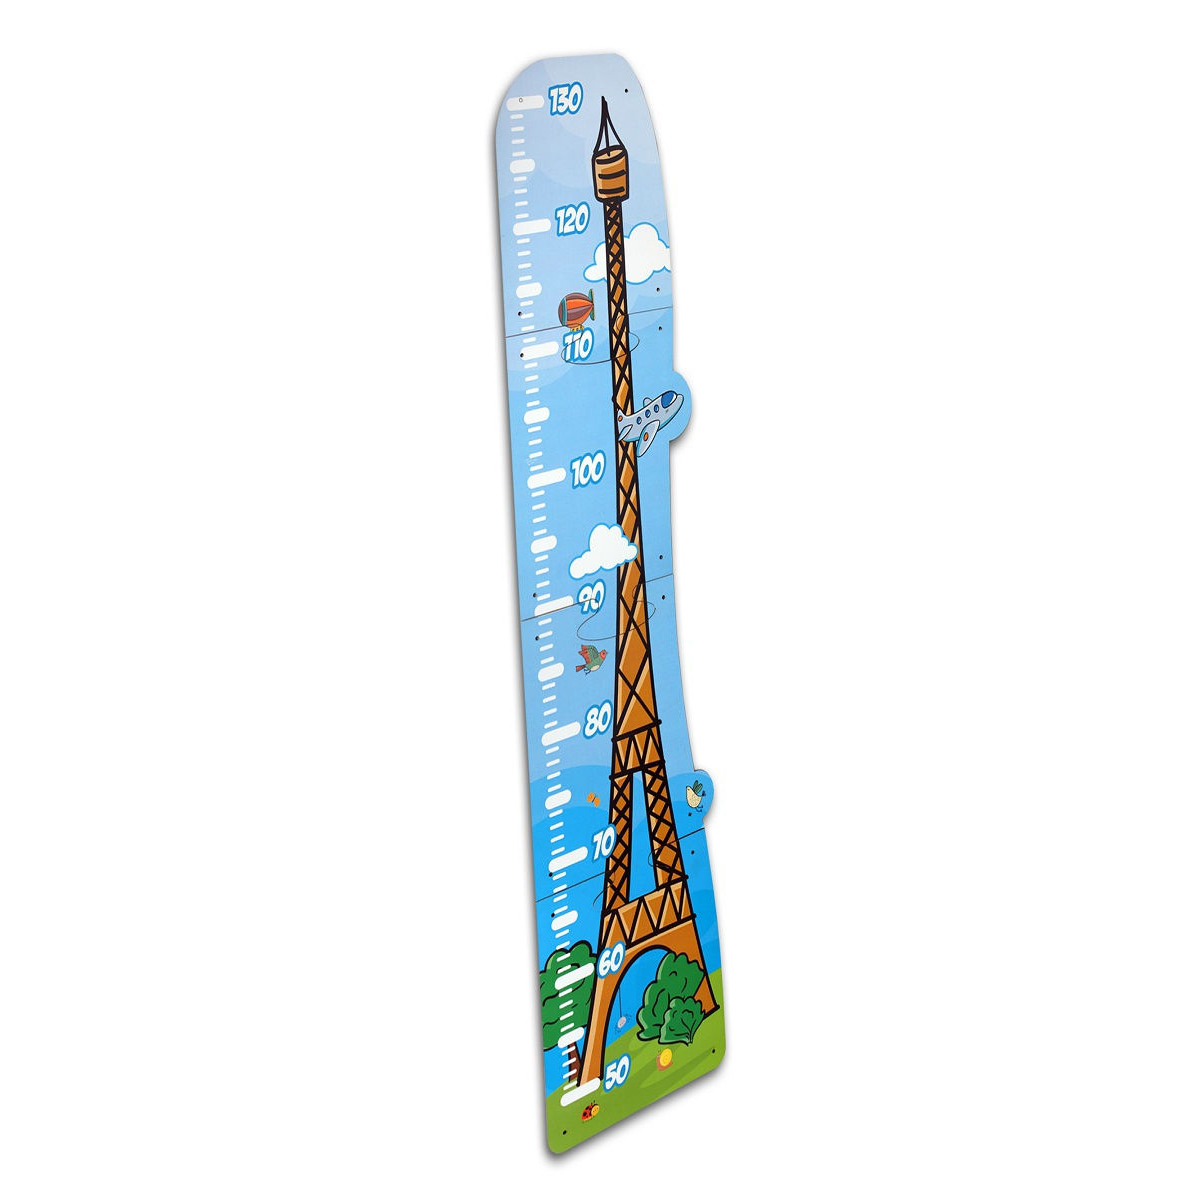 Ростомер - Эйфелева башня фото